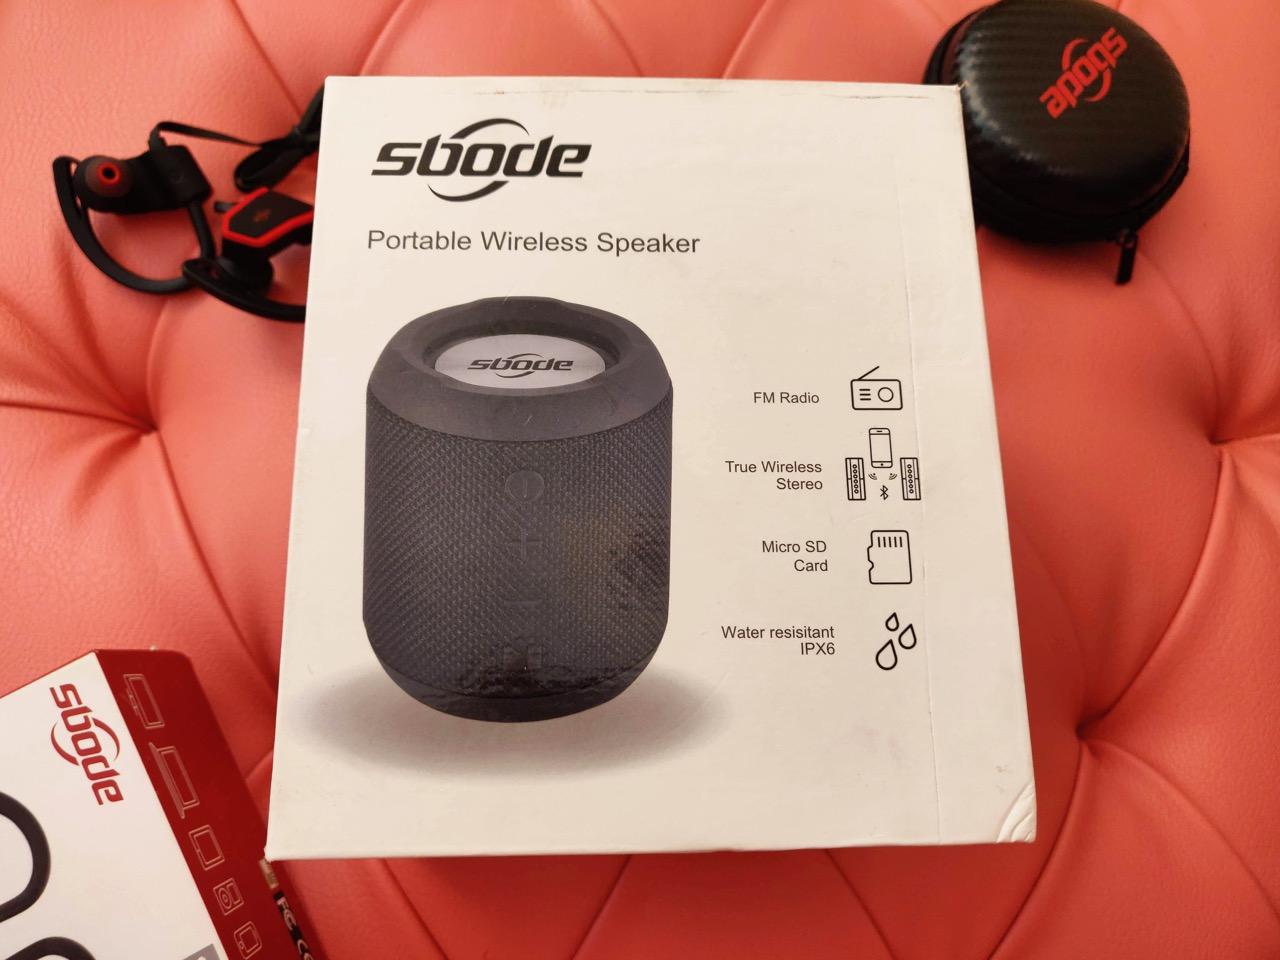 sbodem350-1